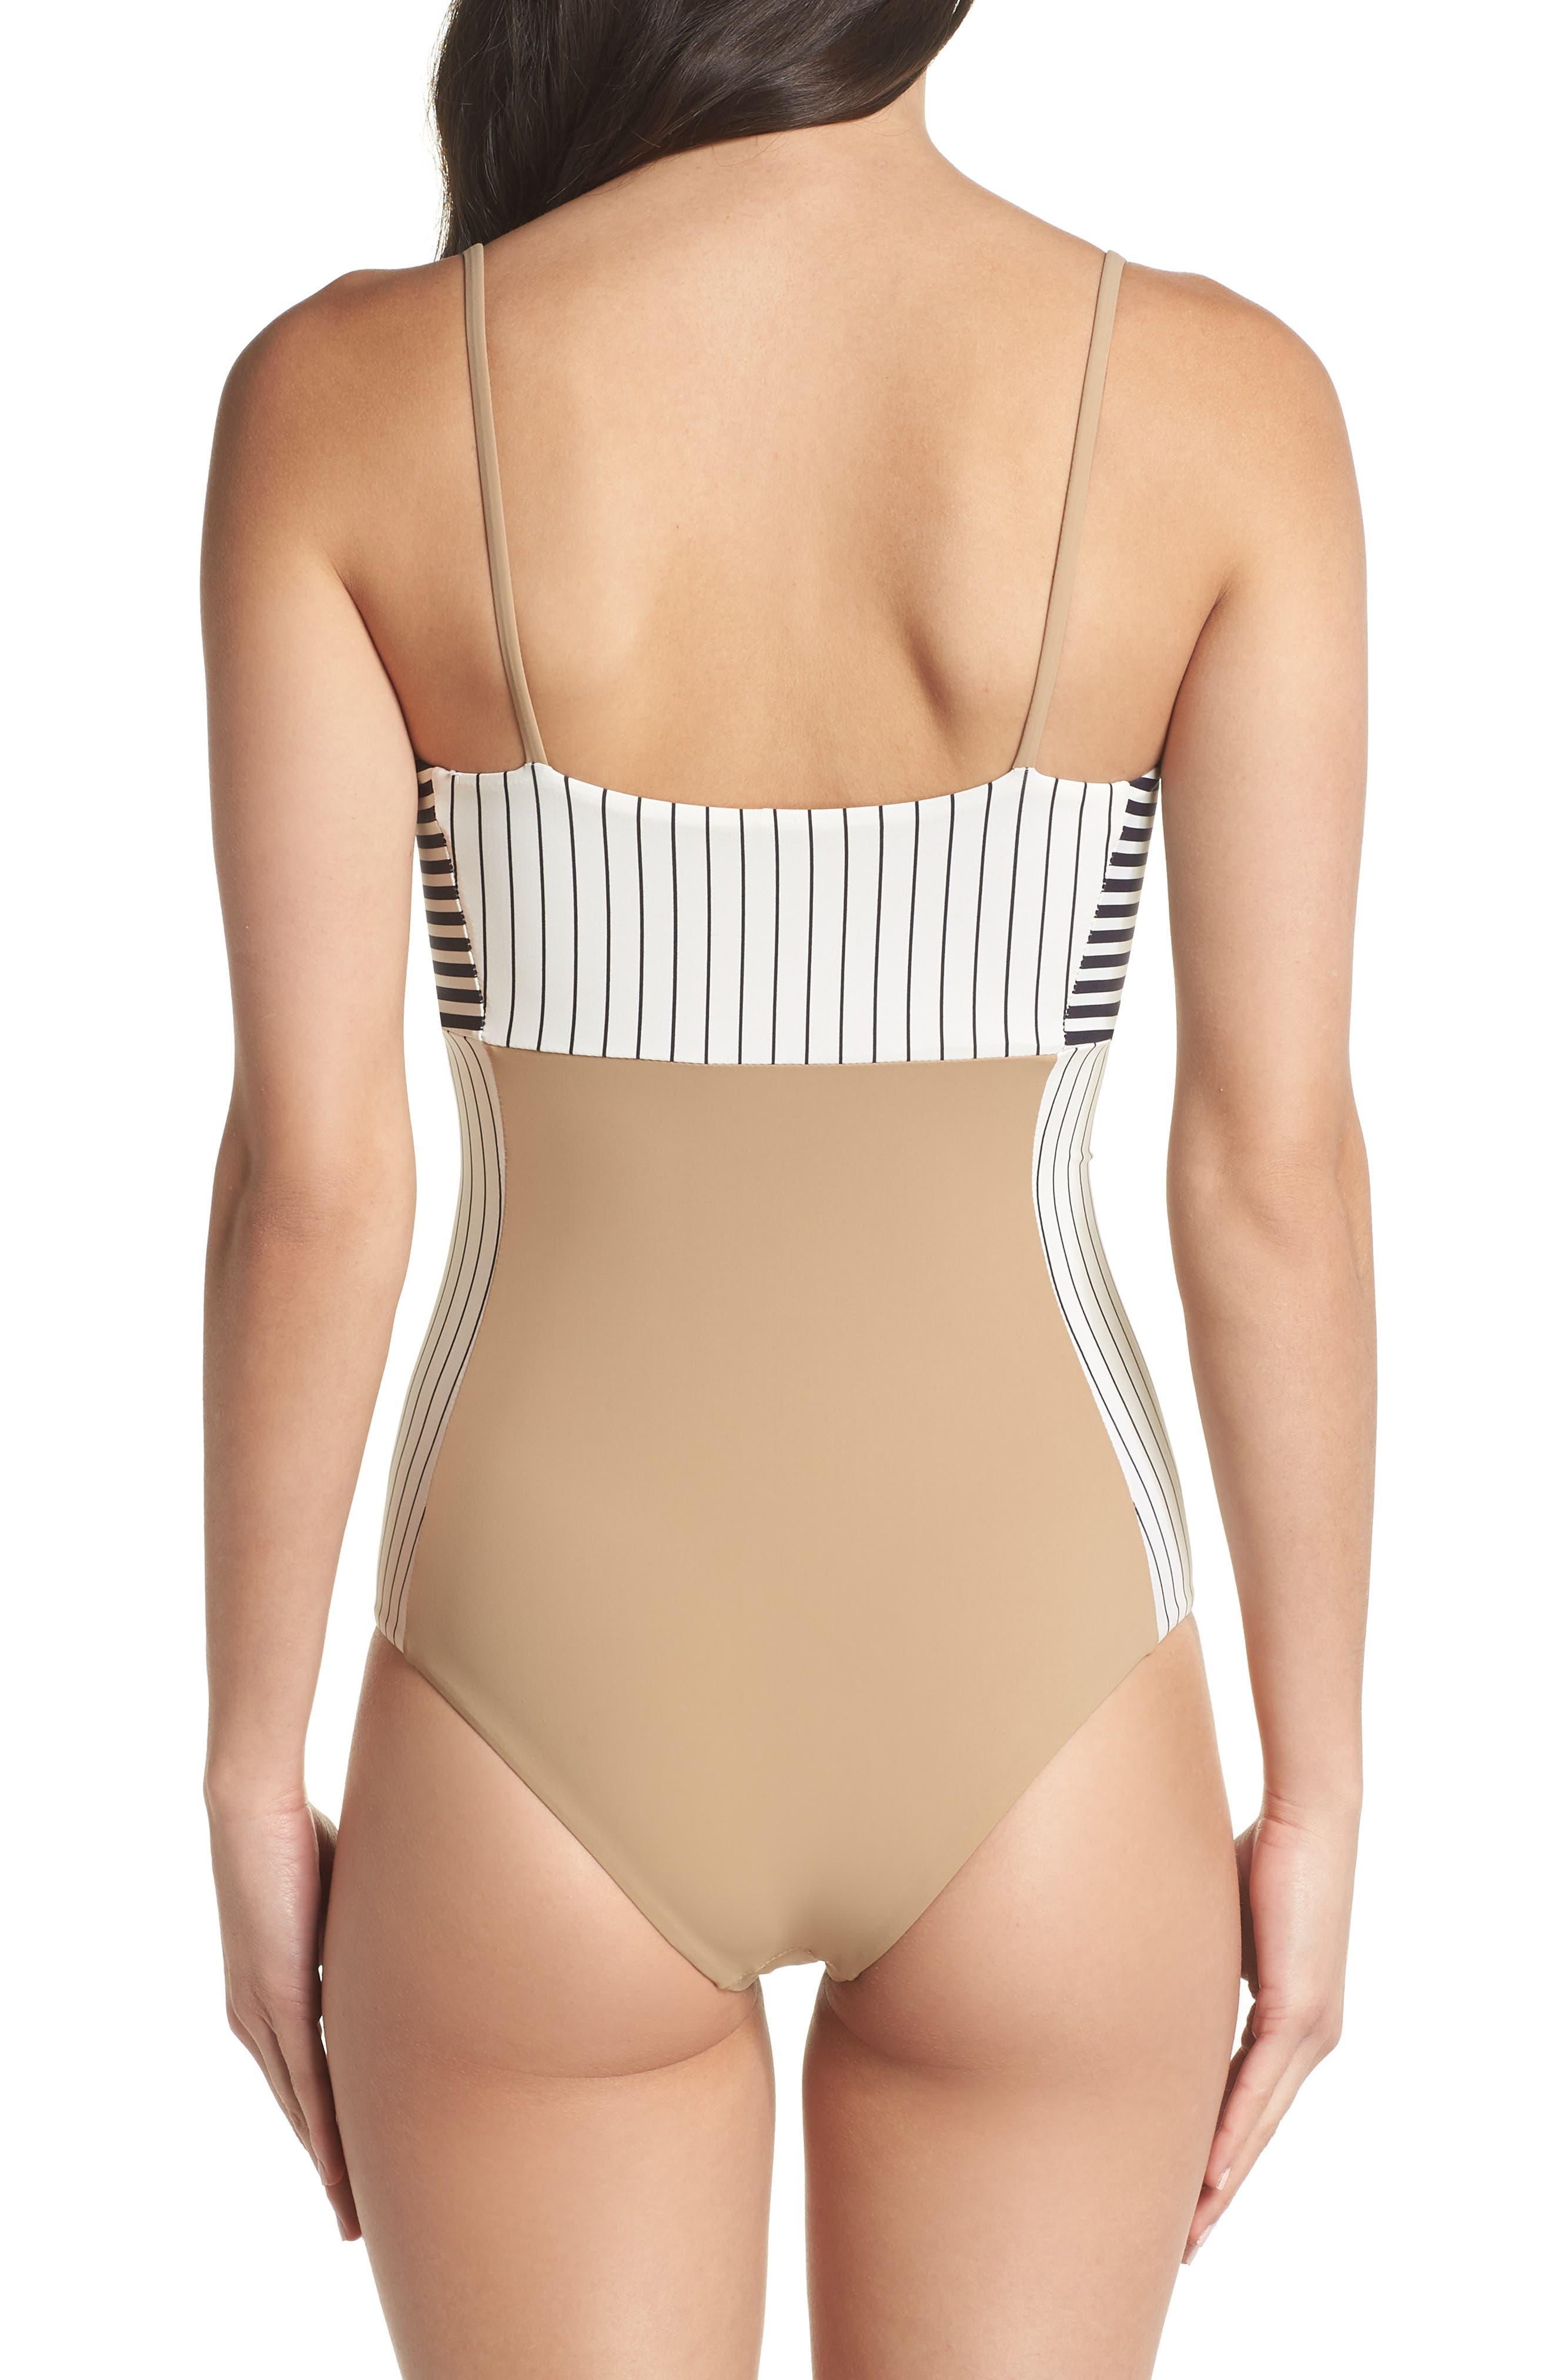 Finn One-Piece Swimsuit,                             Alternate thumbnail 2, color,                             250